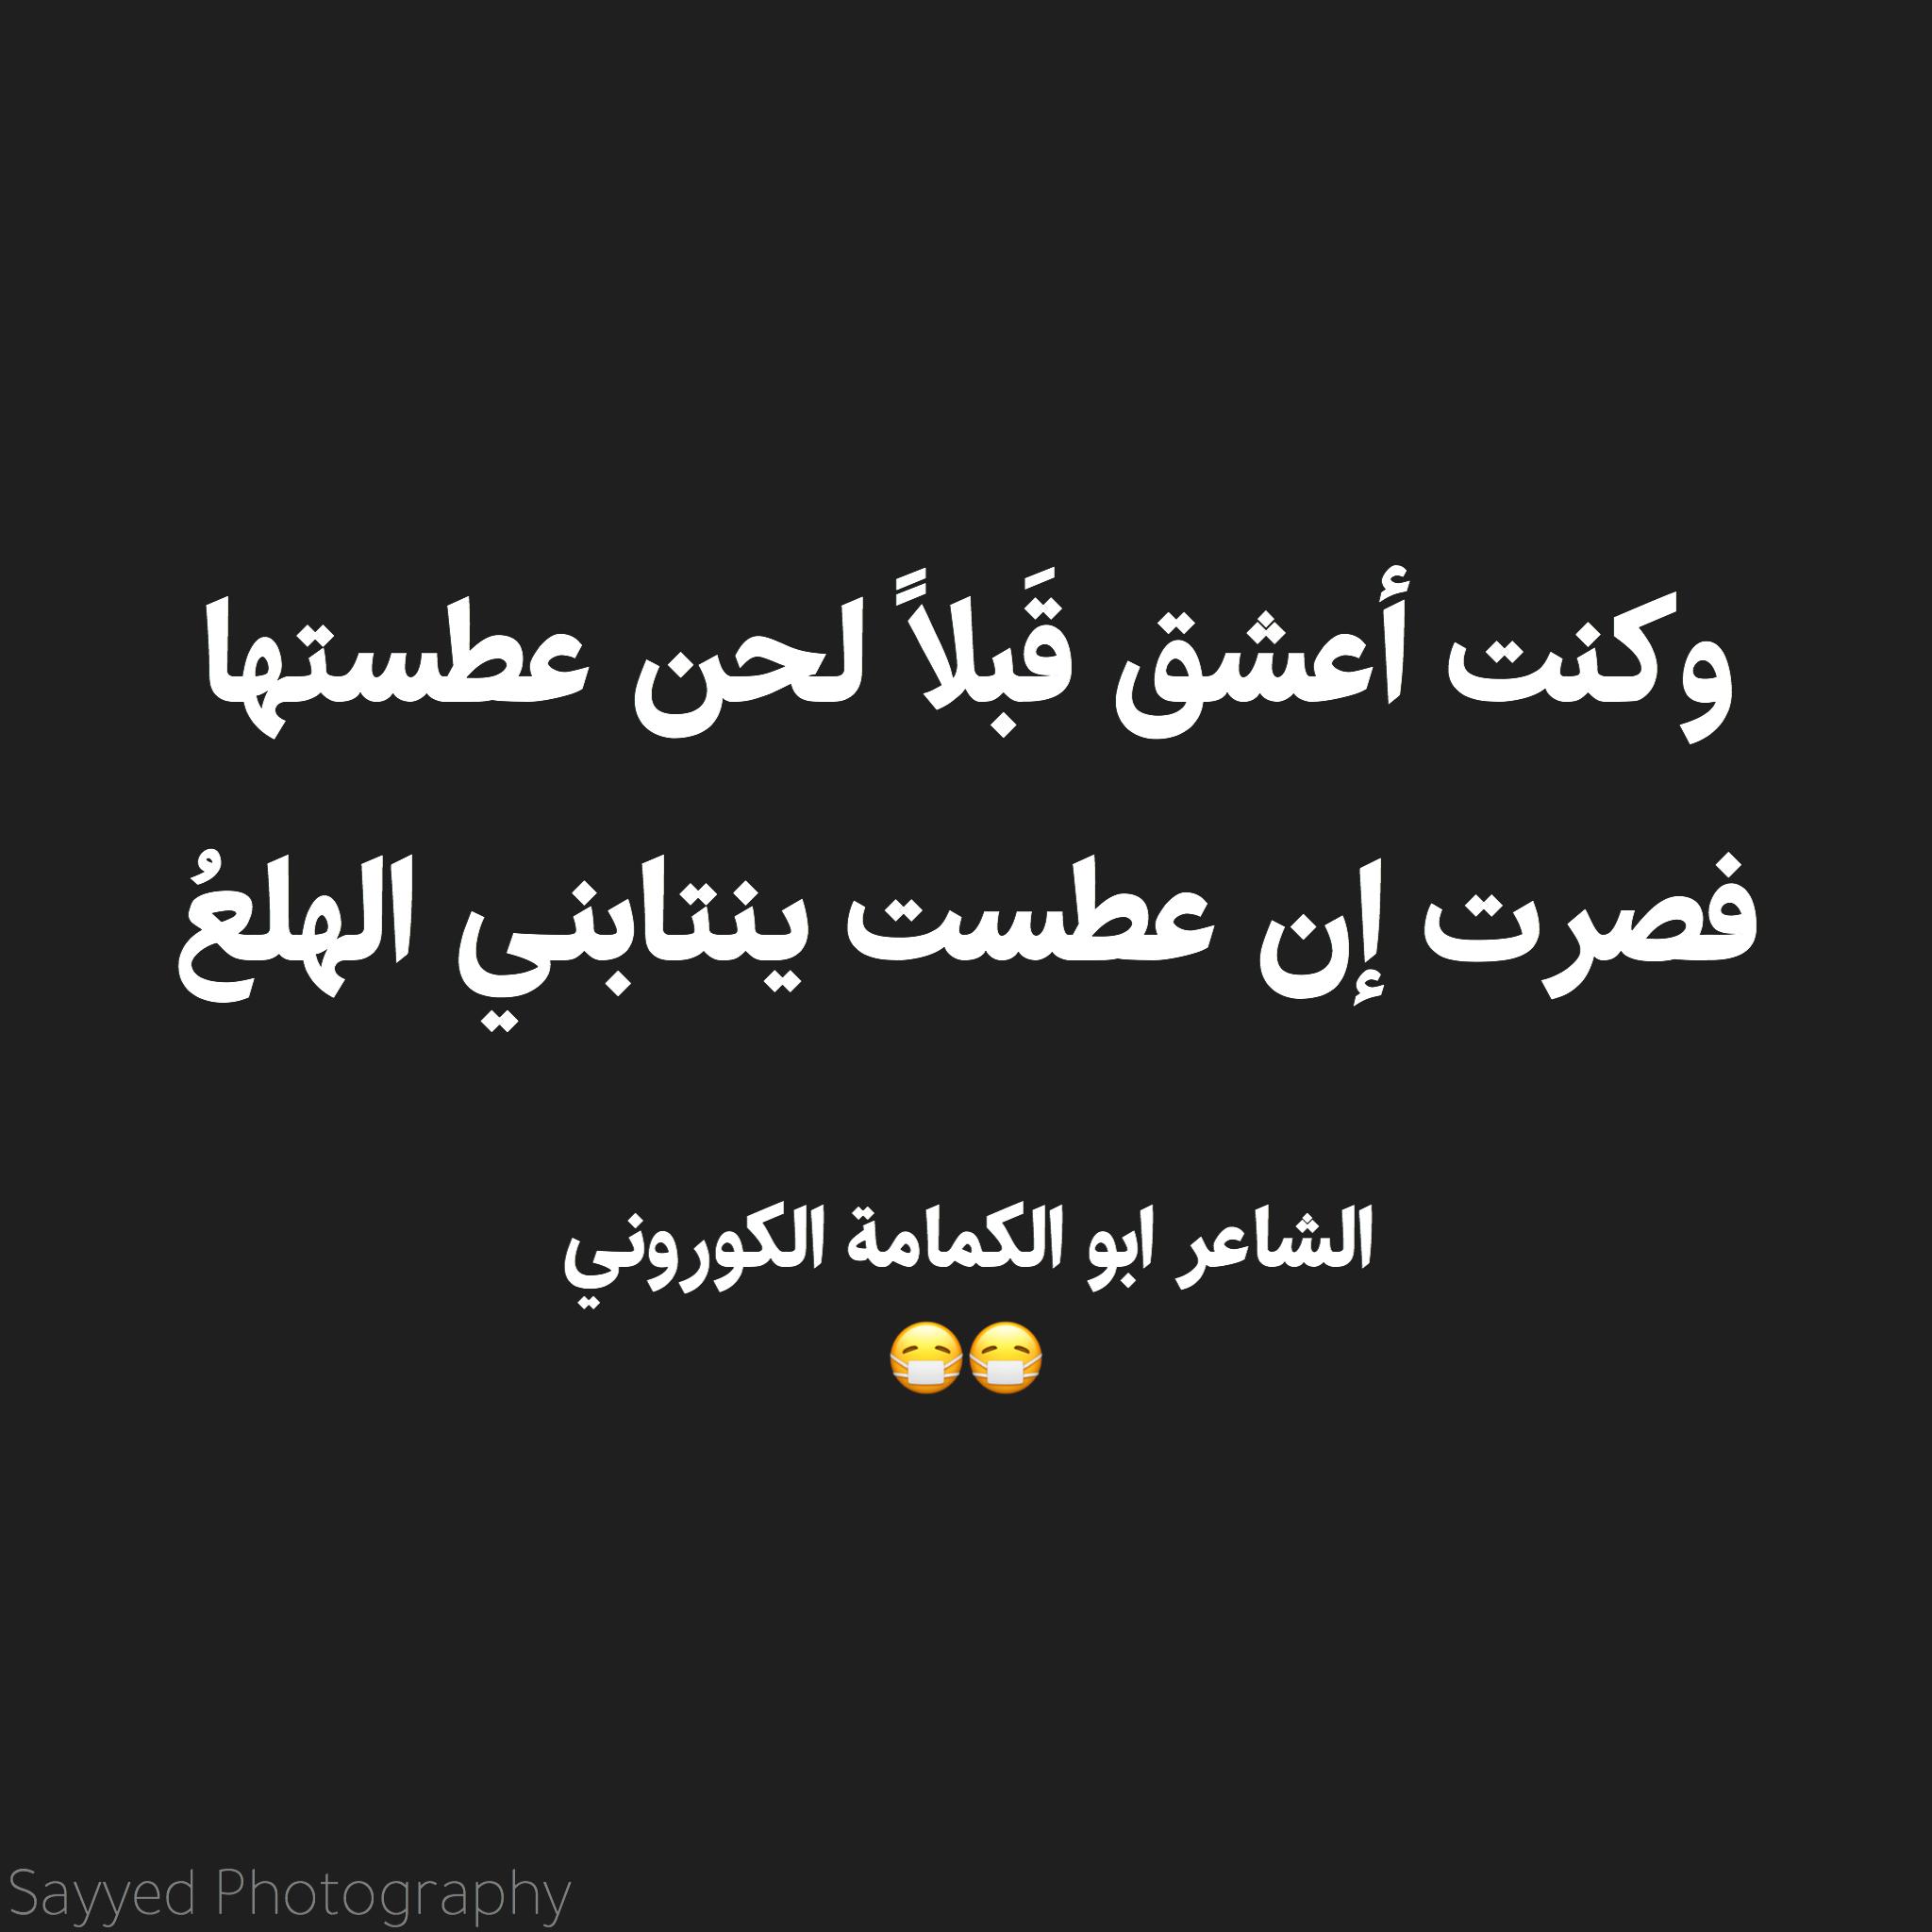 الشاعر ابو الكمامه الكوروني Funny Words Fun Quotes Funny Funny Quotes